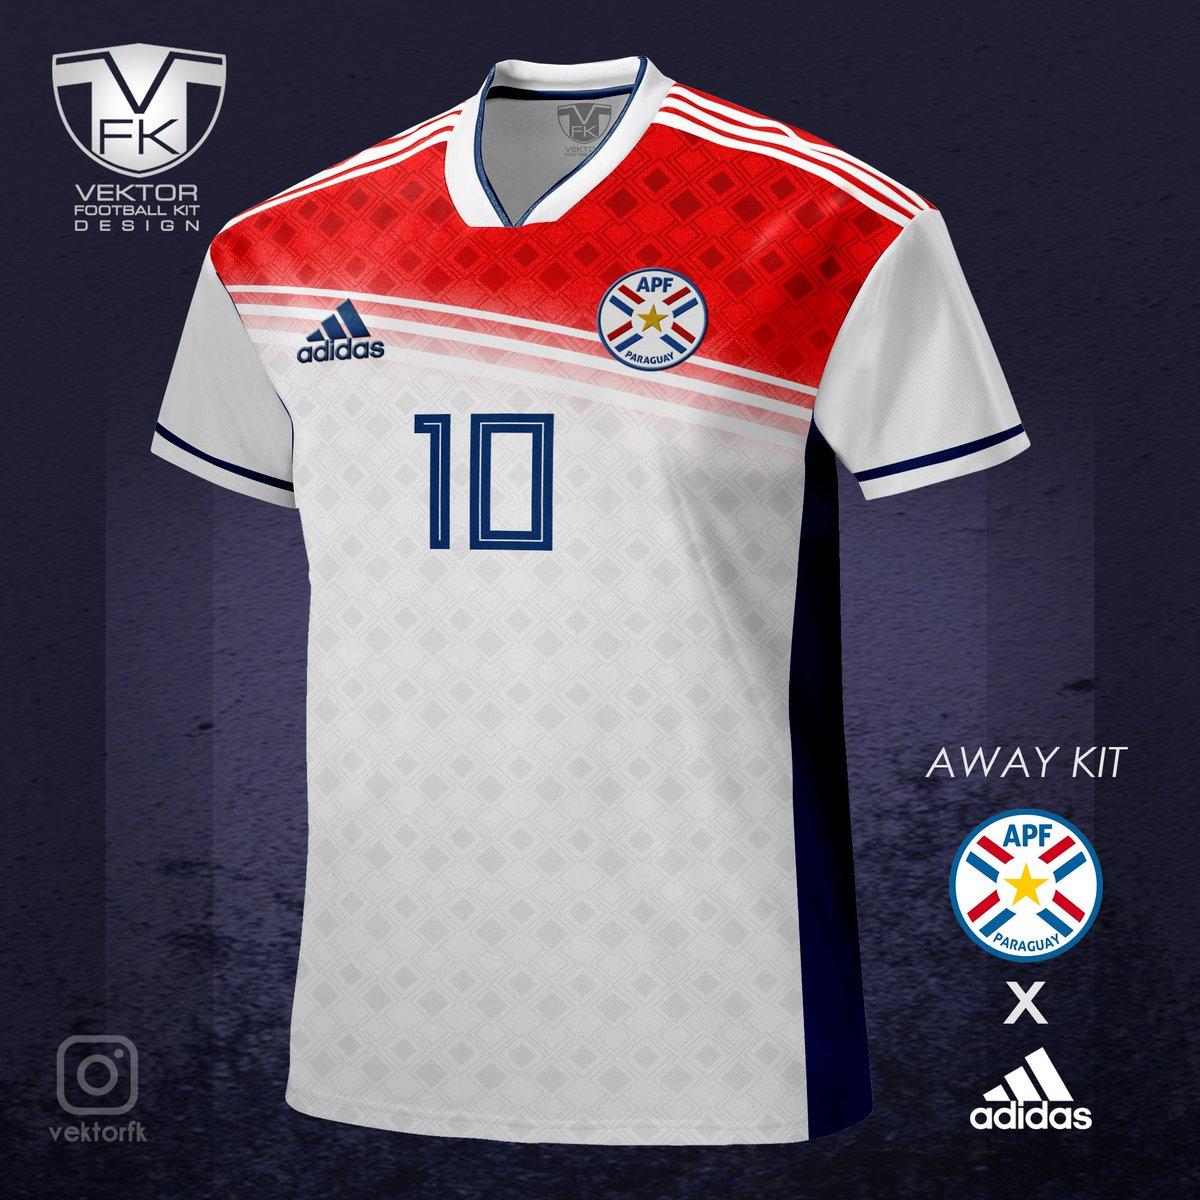 96b4b6a27 Vektor Football Kit 🇵🇾 on Twitter: